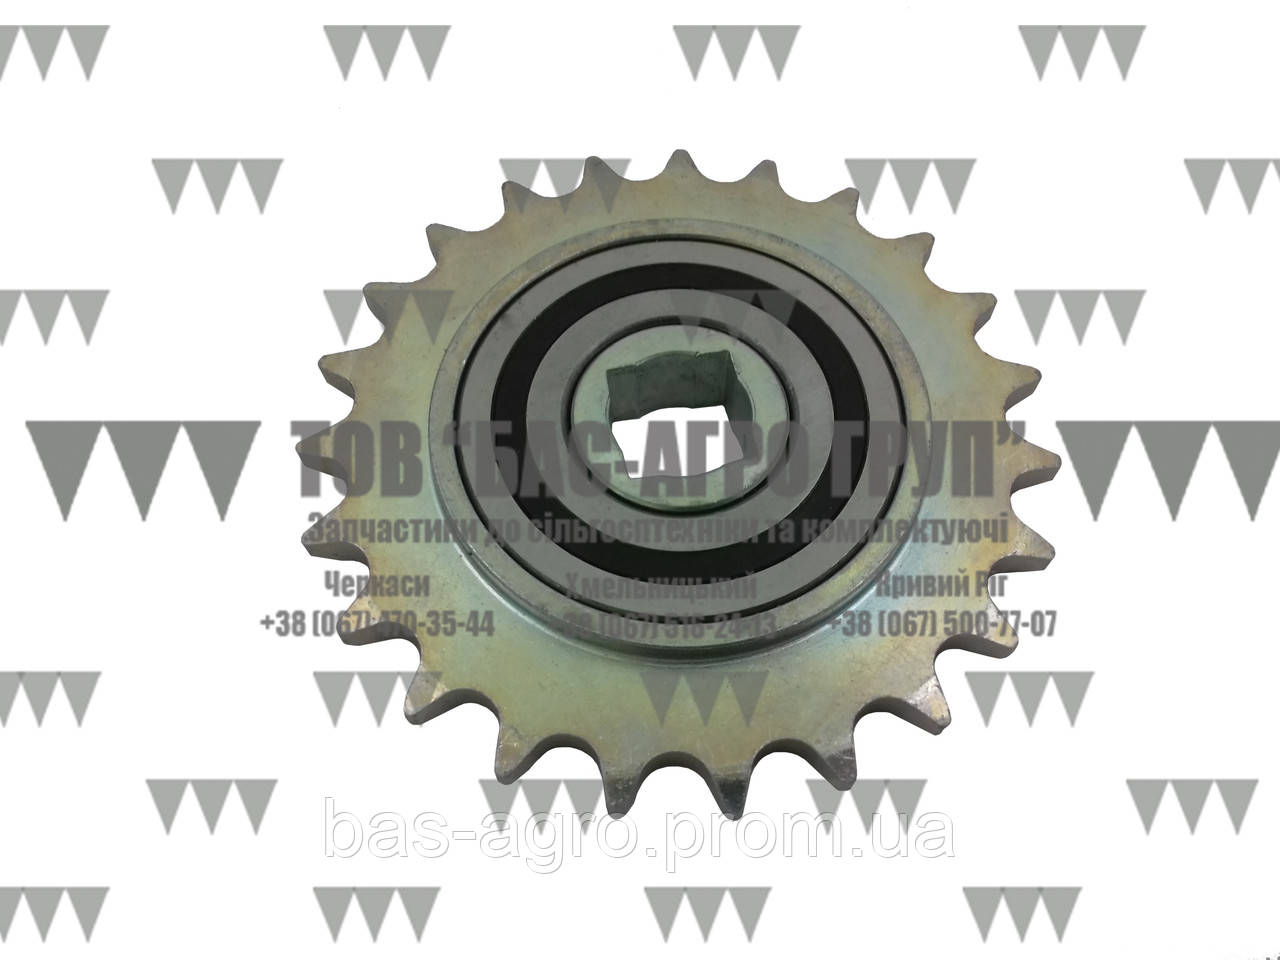 Звездочка Z-23 с обгонной муфтой Gaspardo G17131500/G16630370/G16631120 аналог